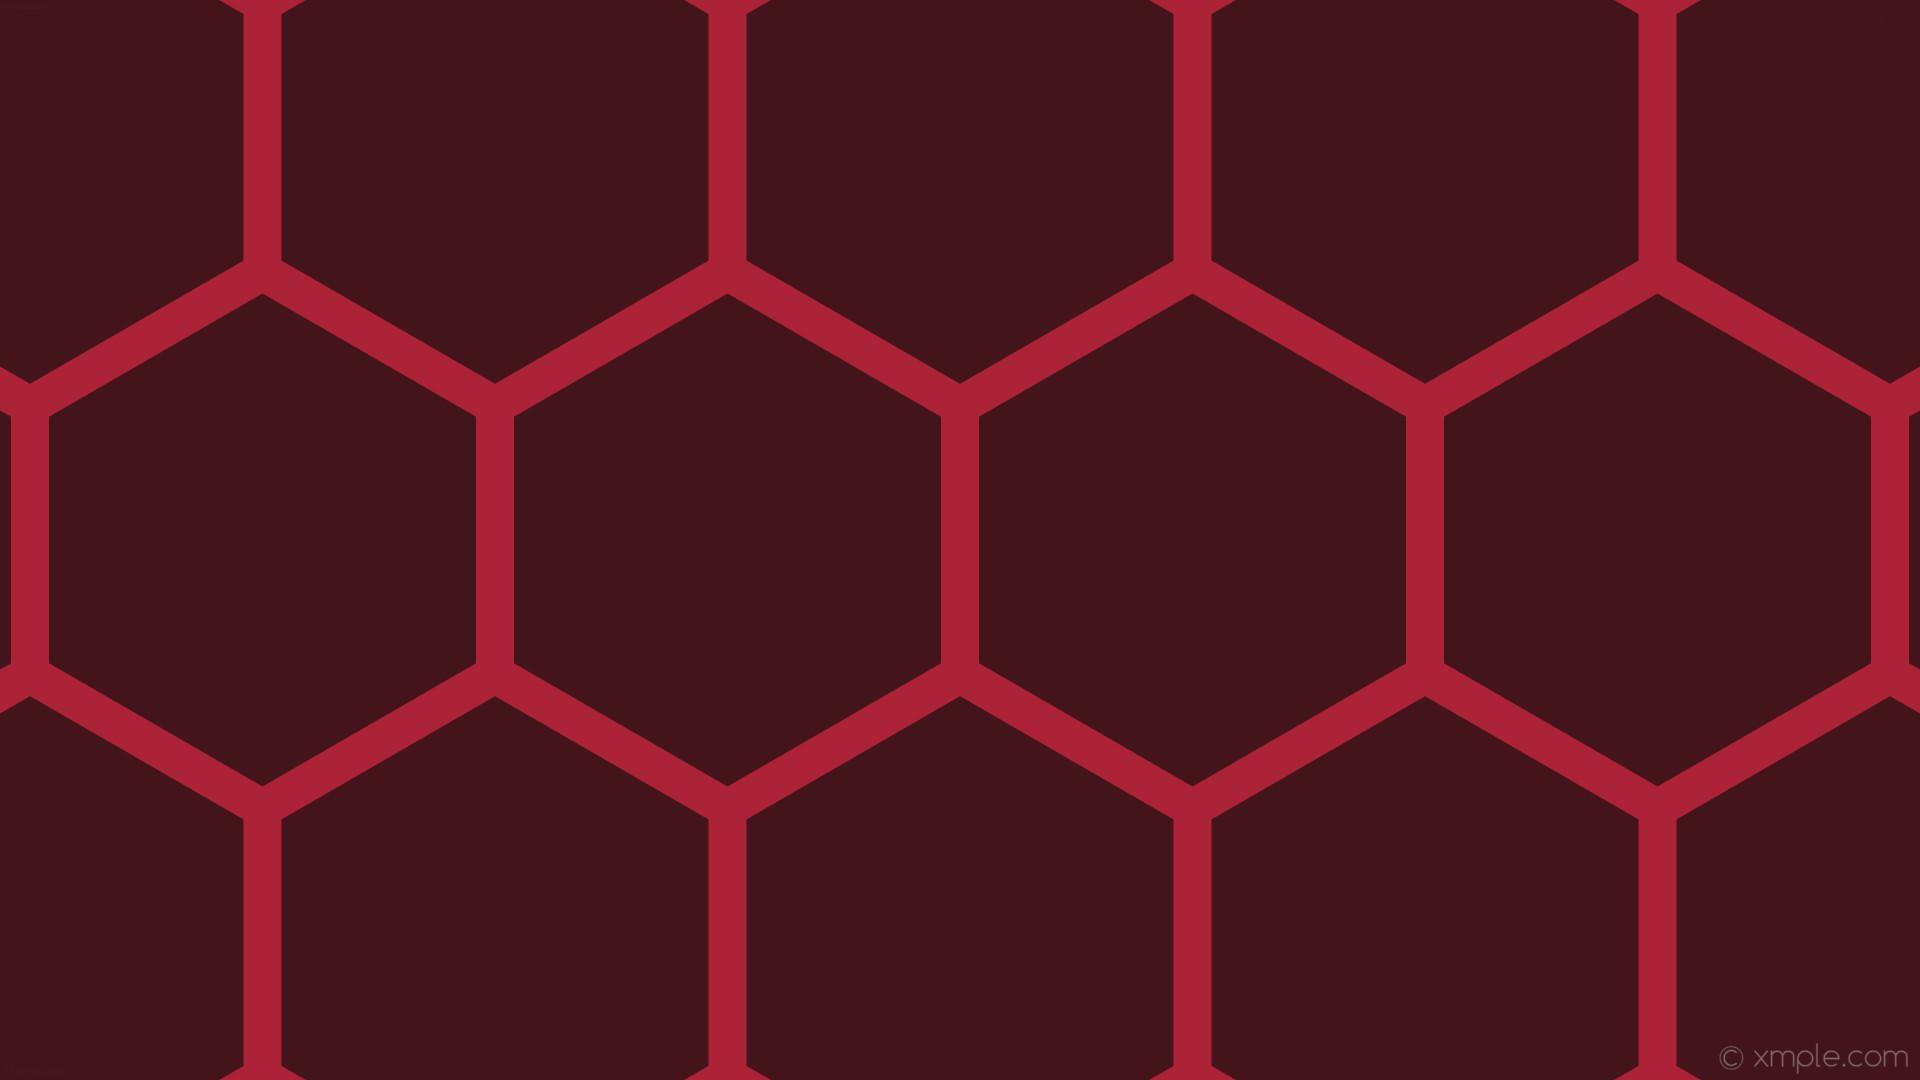 wallpaper honeycomb beehive red hexagon dark red #44141b #ac2236 0° 38px  465px